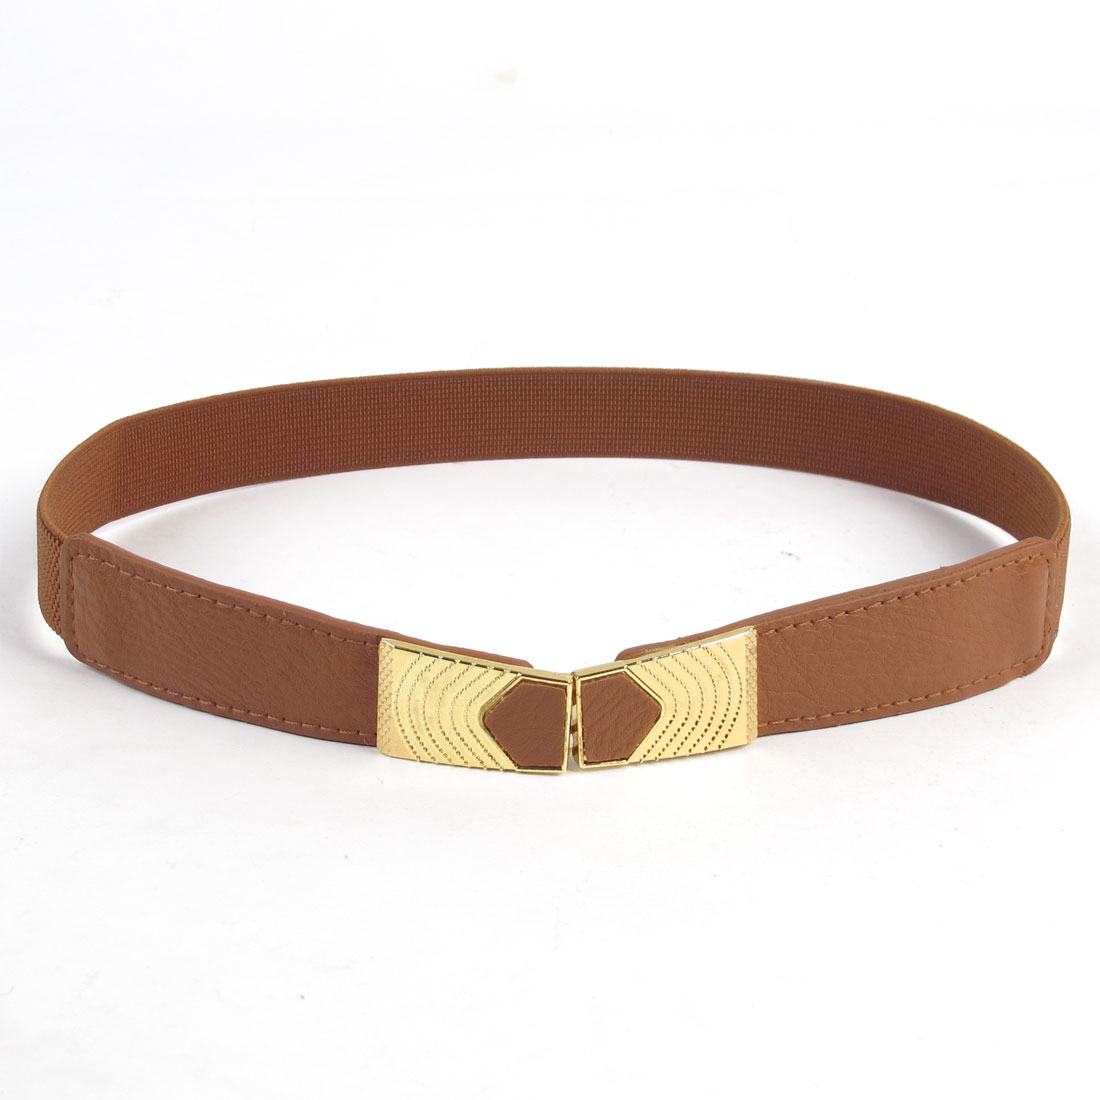 Lady Gold Tone Metal Interlocking Buckle Waistbelt Cinch Belt Brown